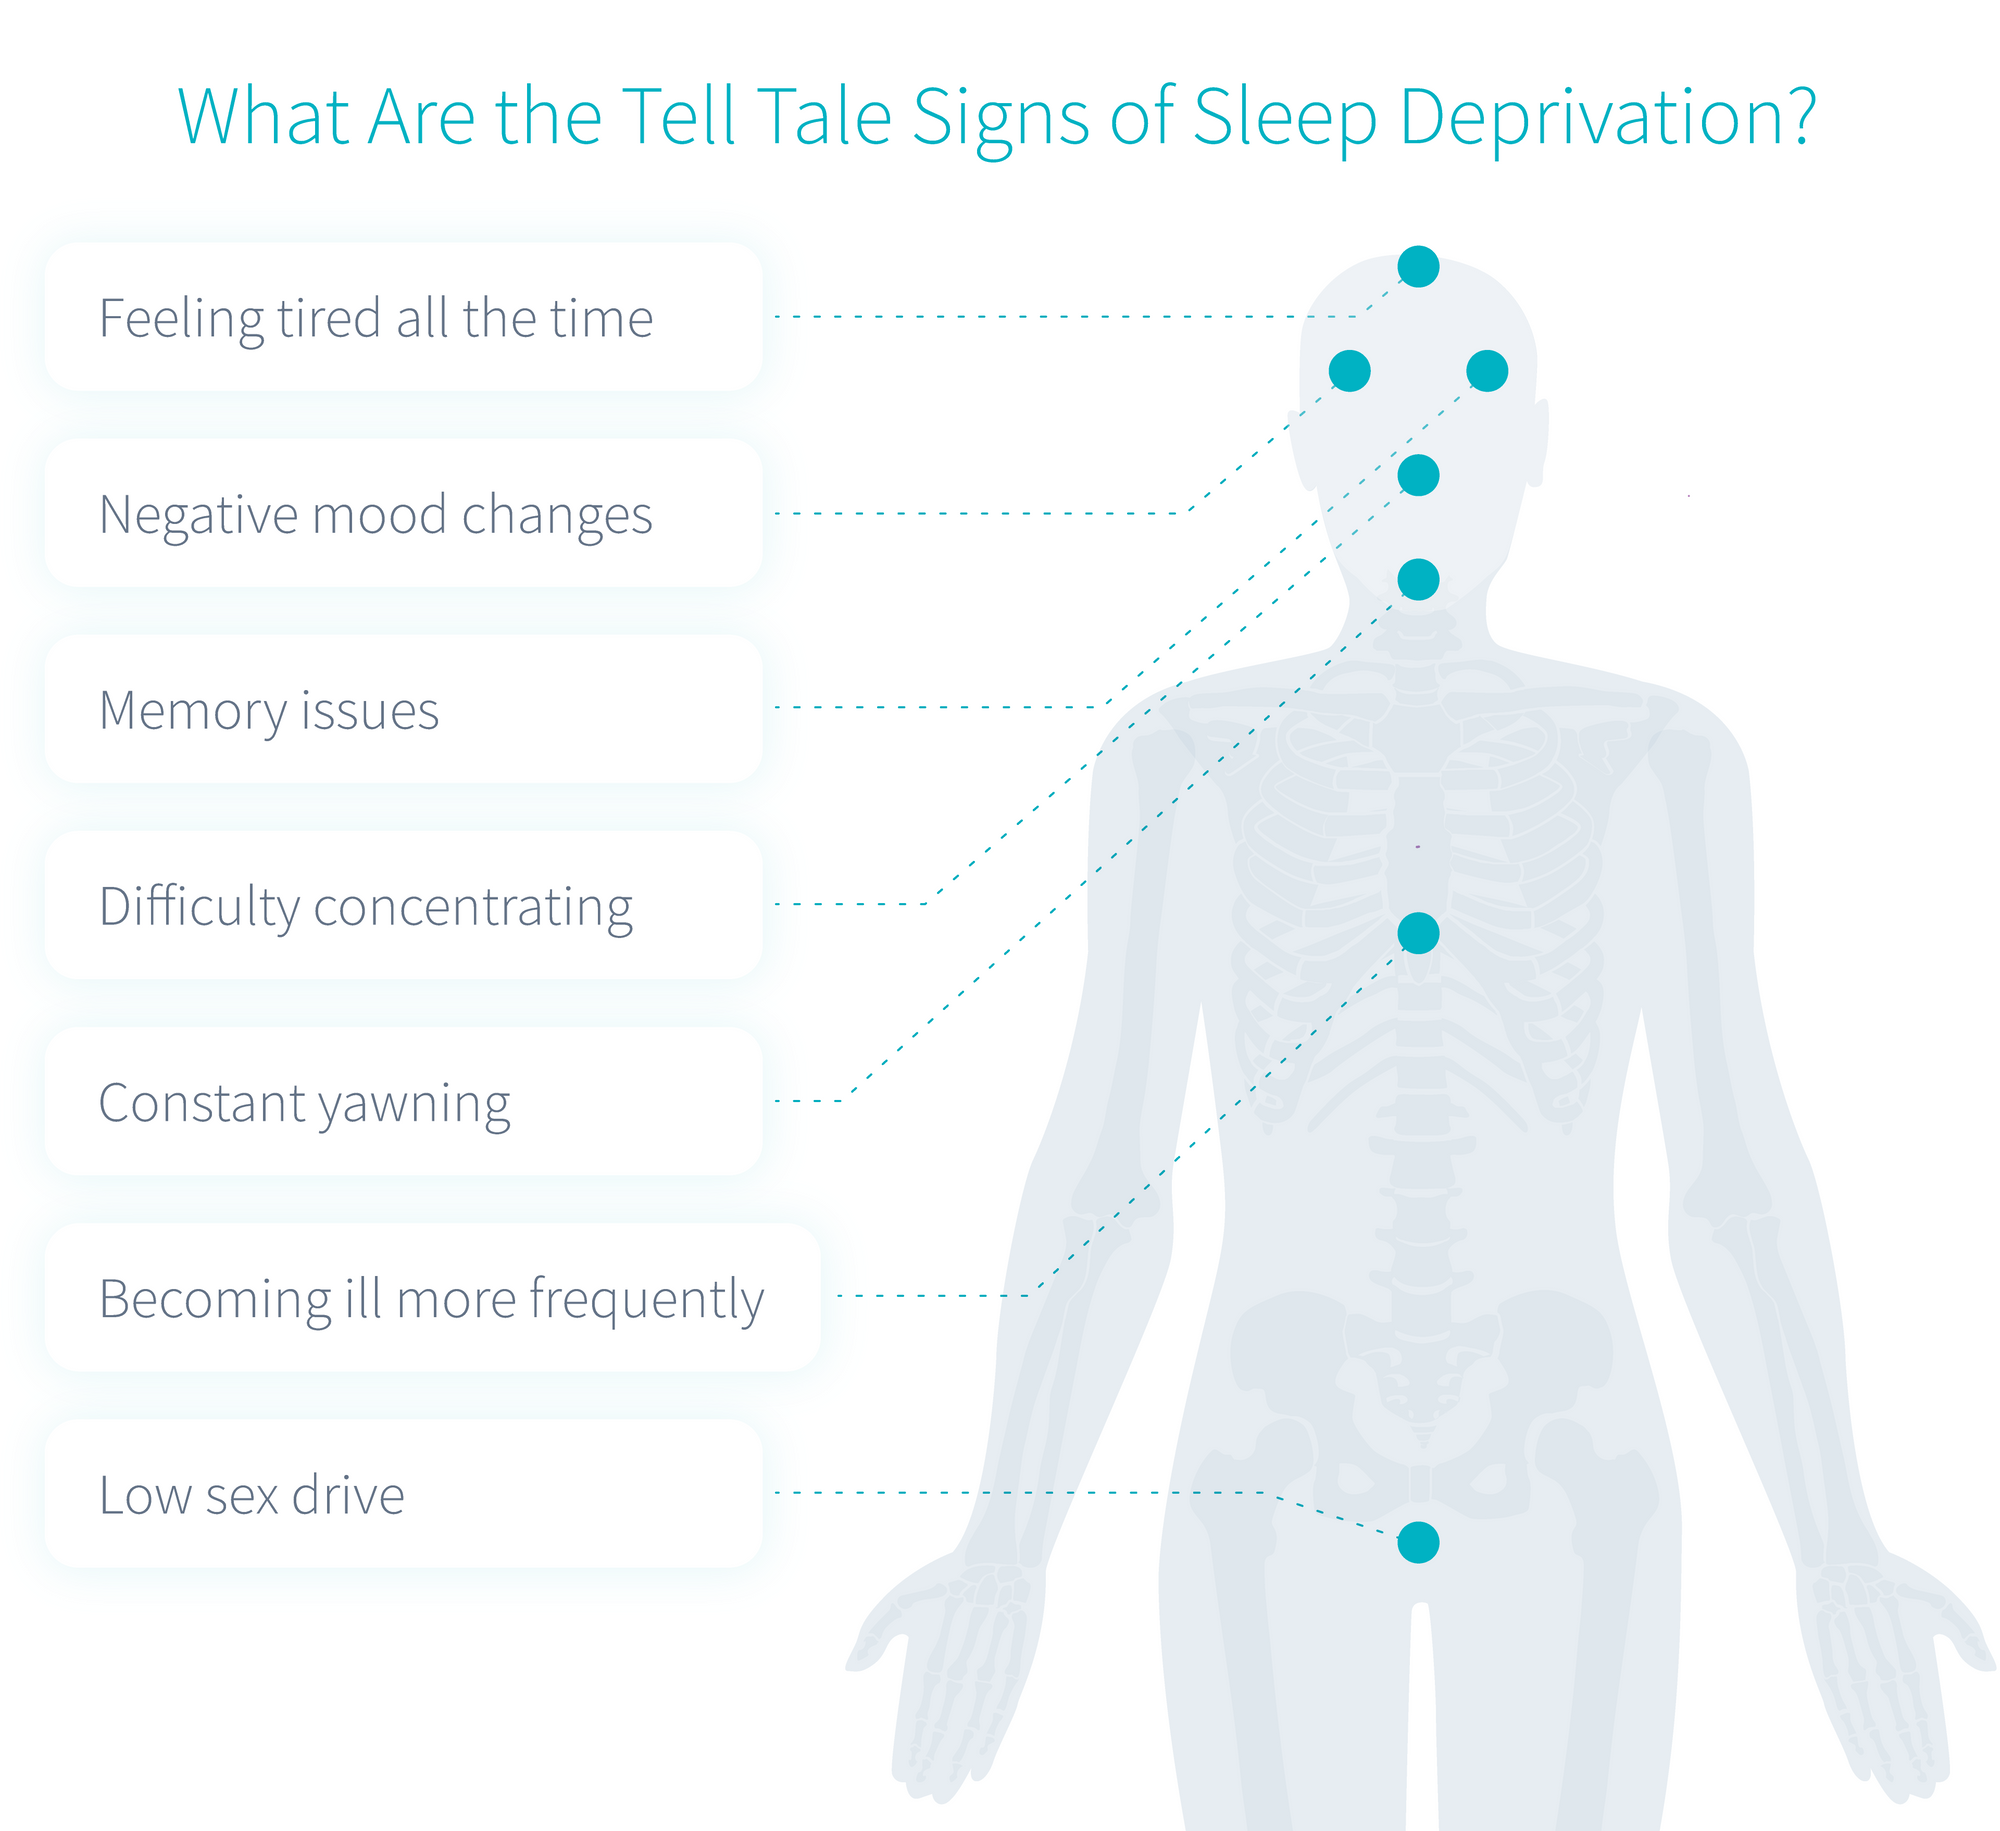 sleep-deprivation-symptoms-letsgetchecked-illustration